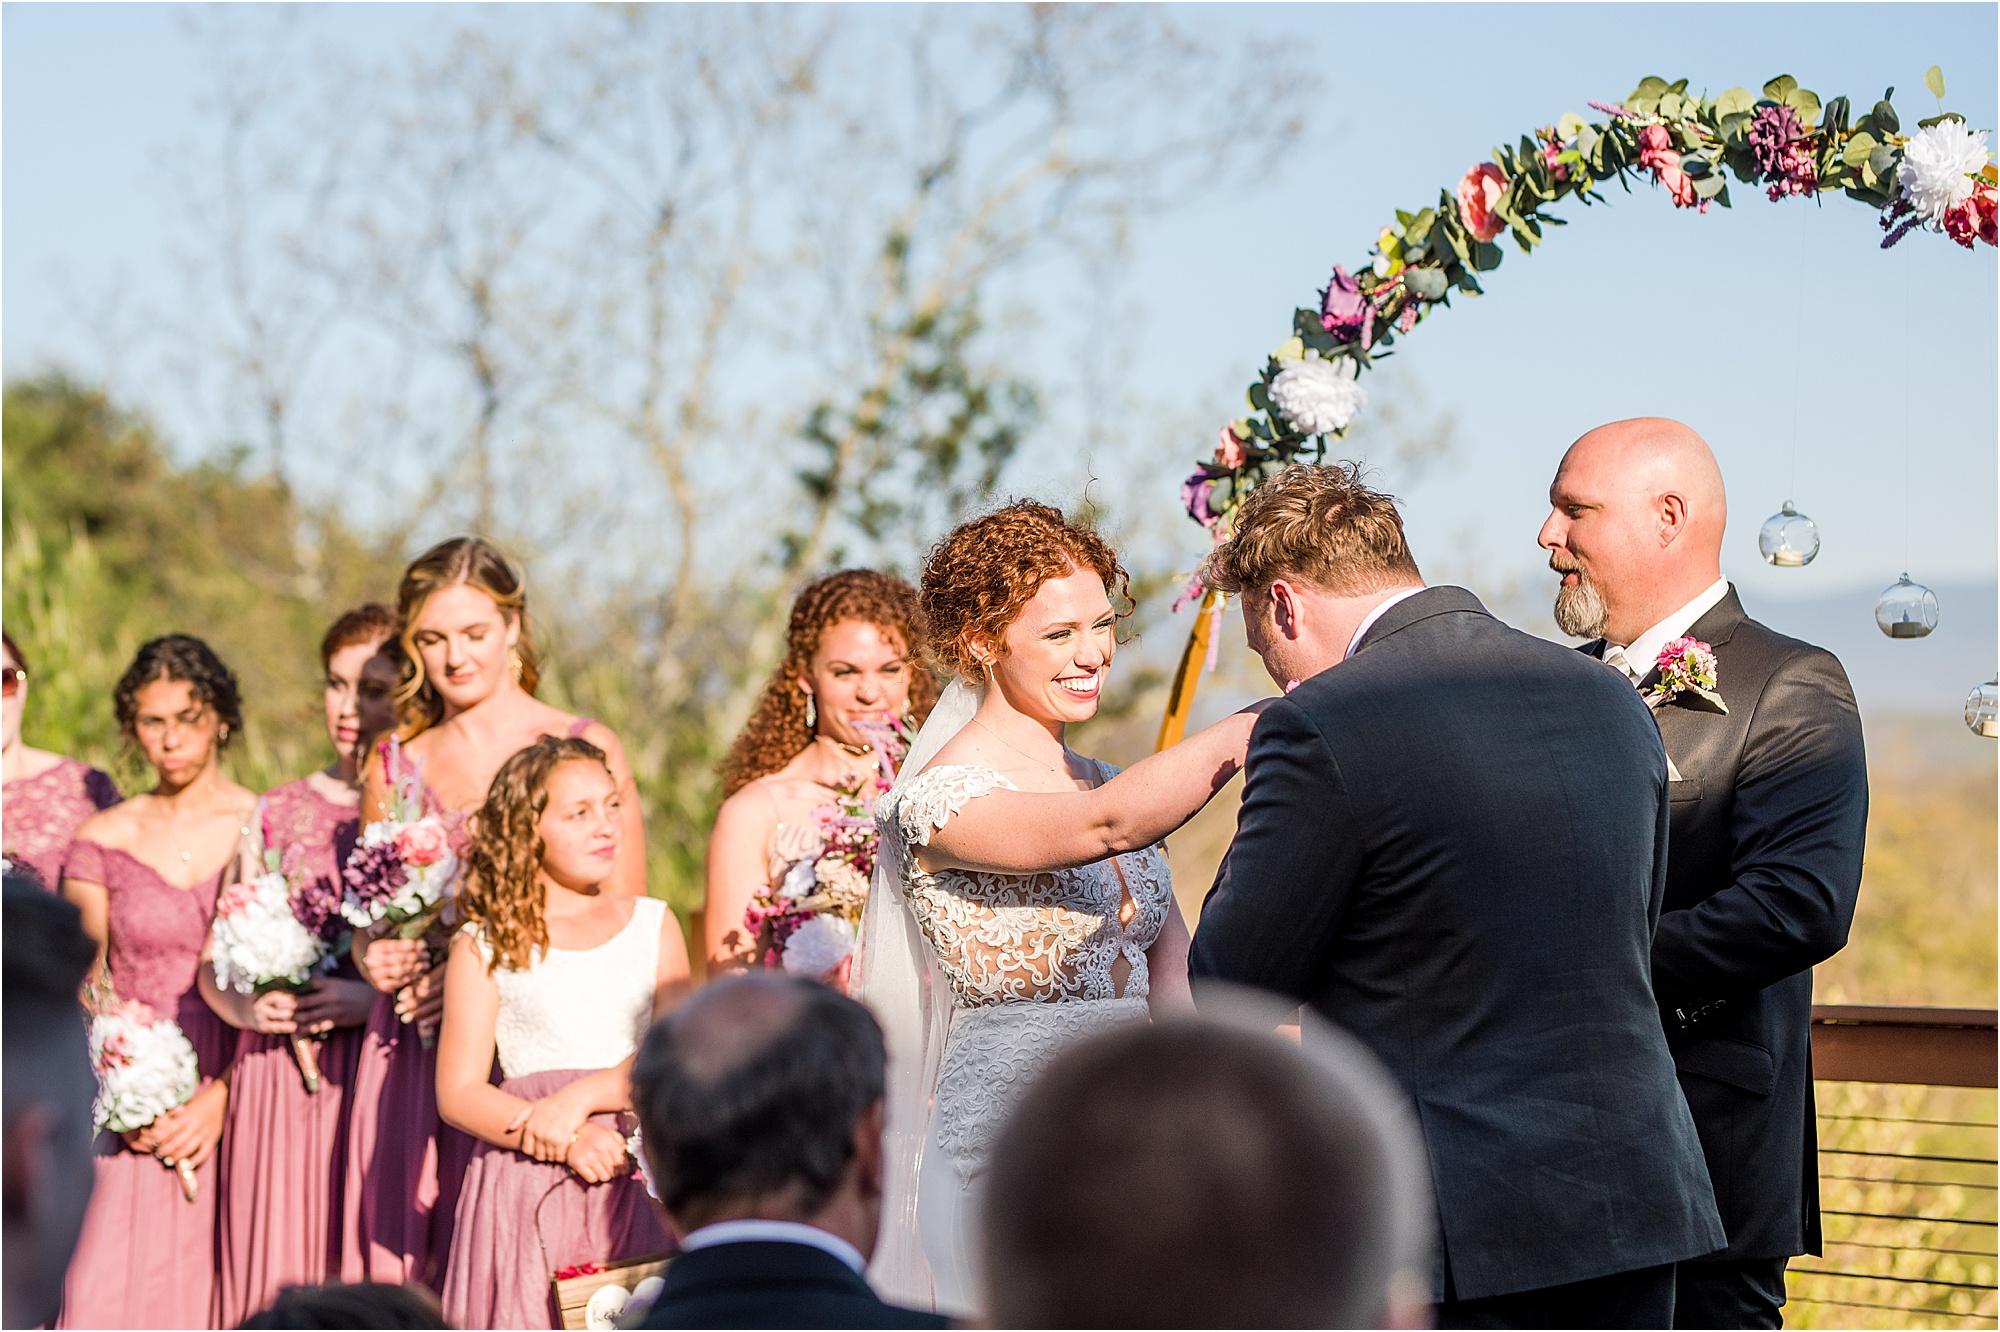 groom kisses bride's hand at wedding ceremony